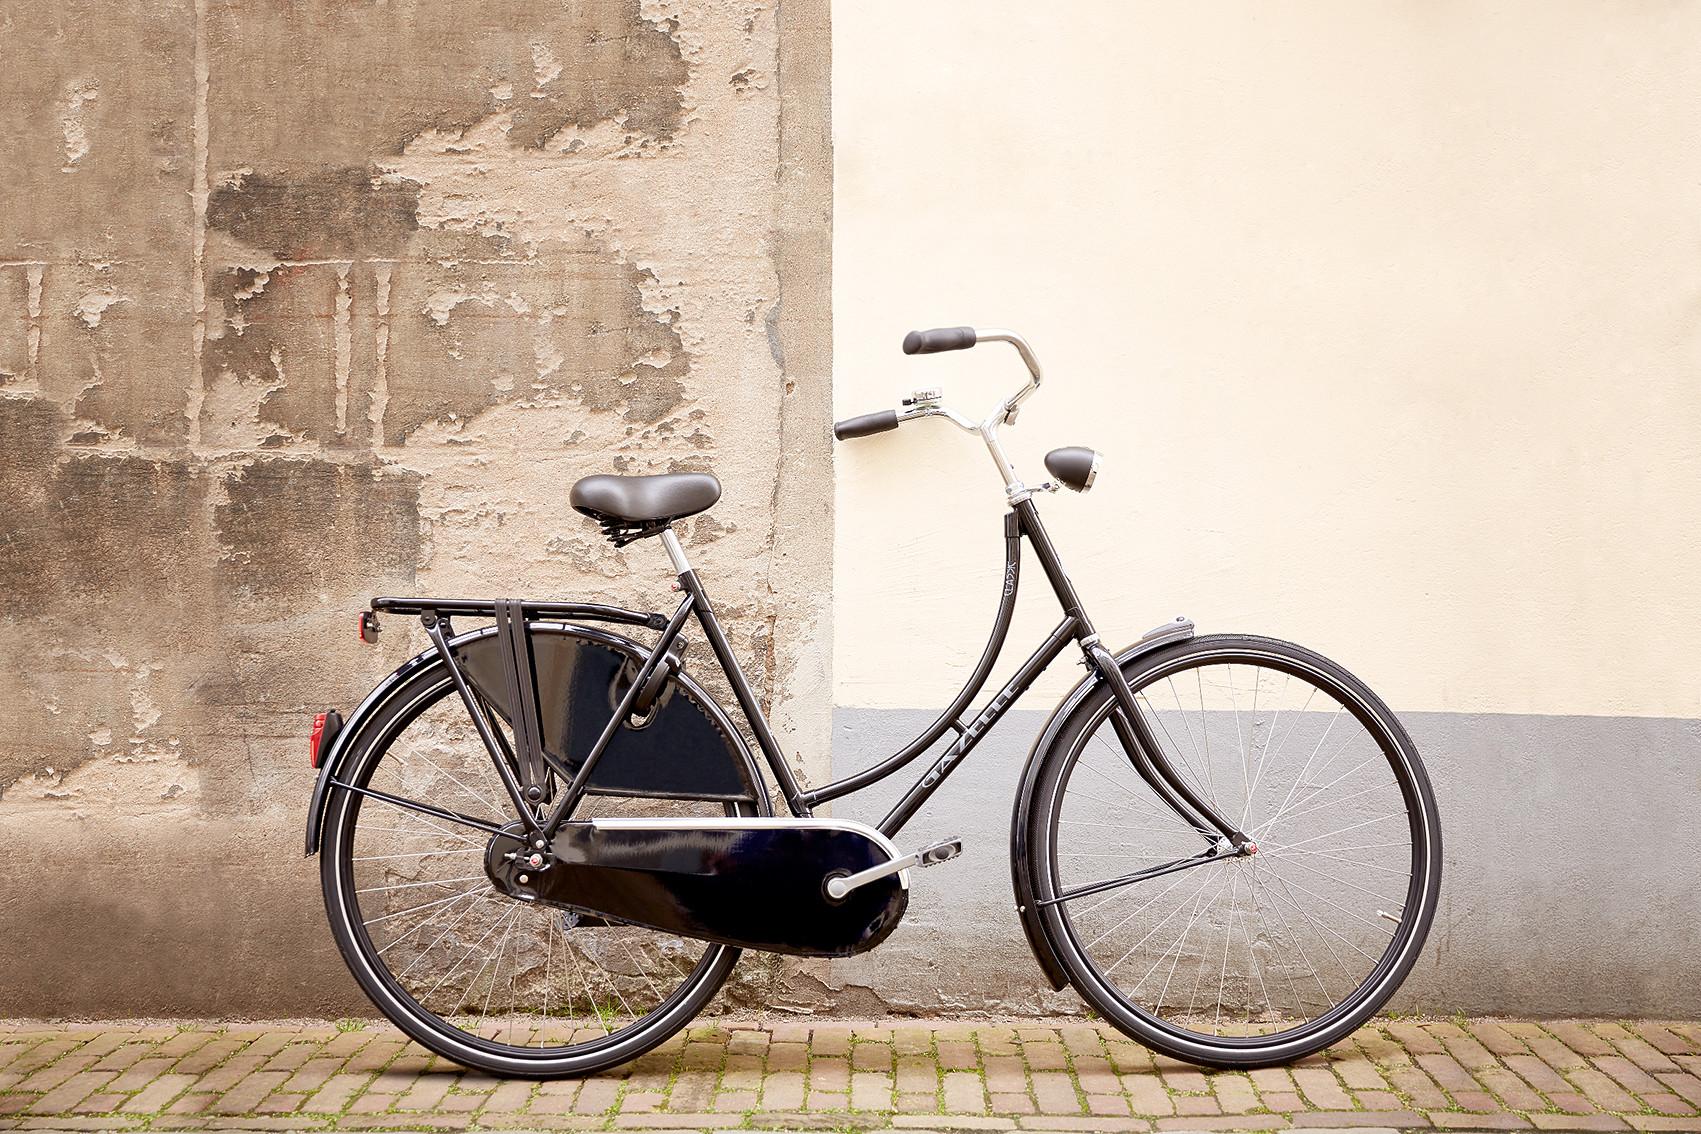 Mythos Hollandrad Gazelle Classic Panther - Hollandrad kaufen - Test - Information Lucky Bike